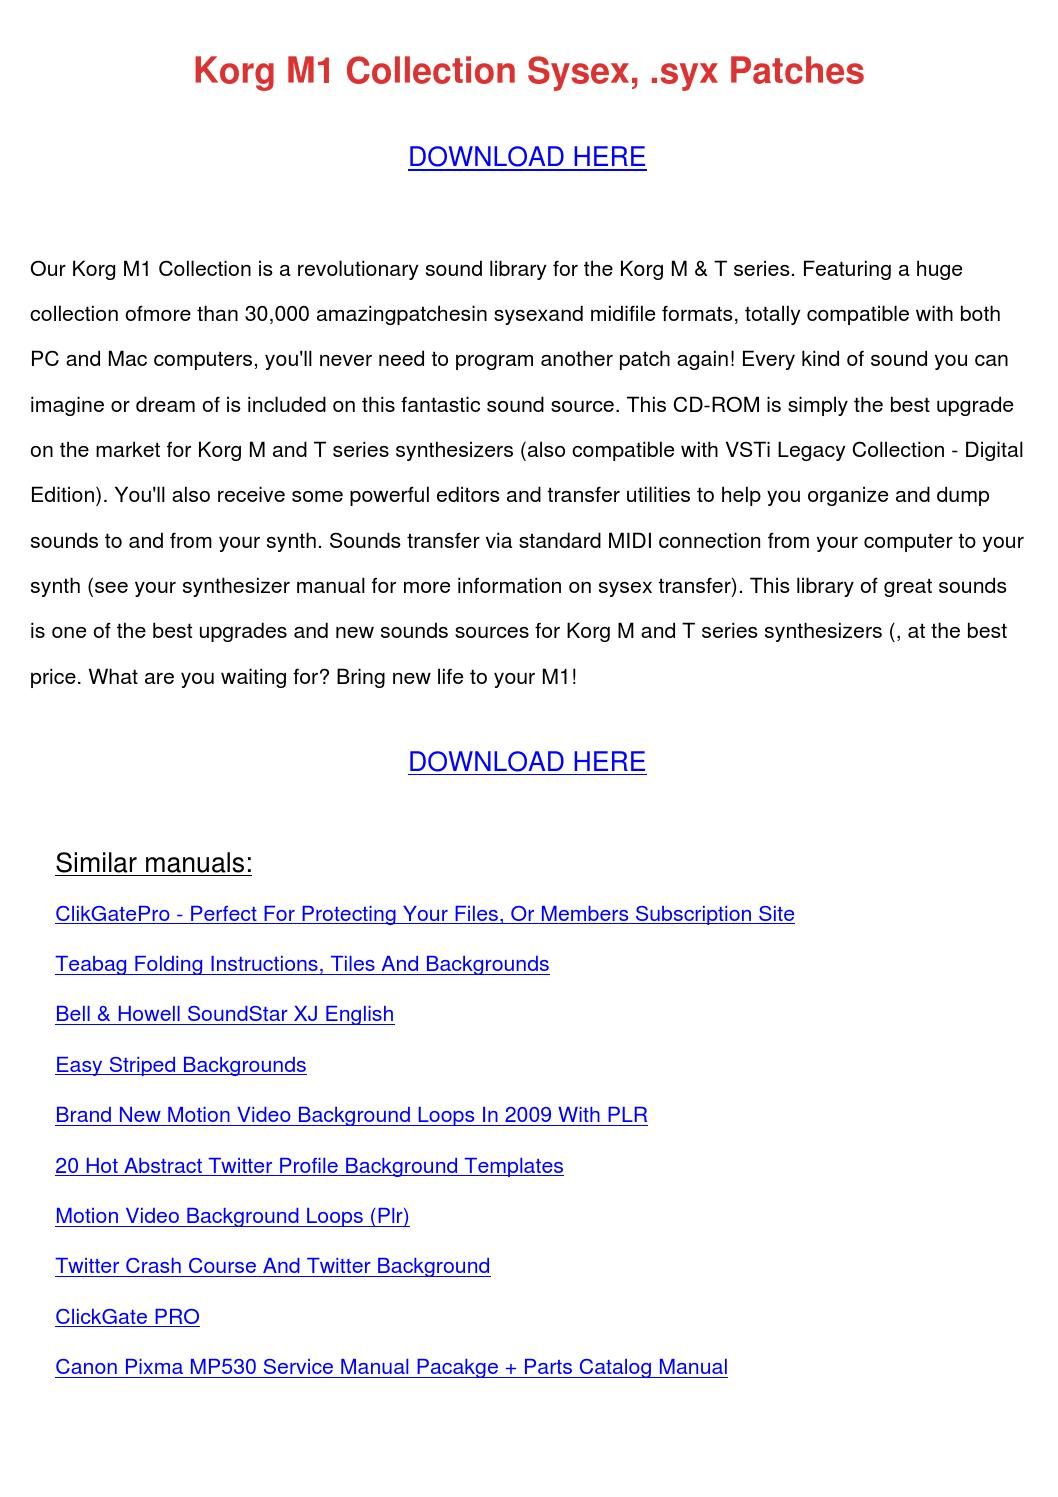 syx files korg m1 manual